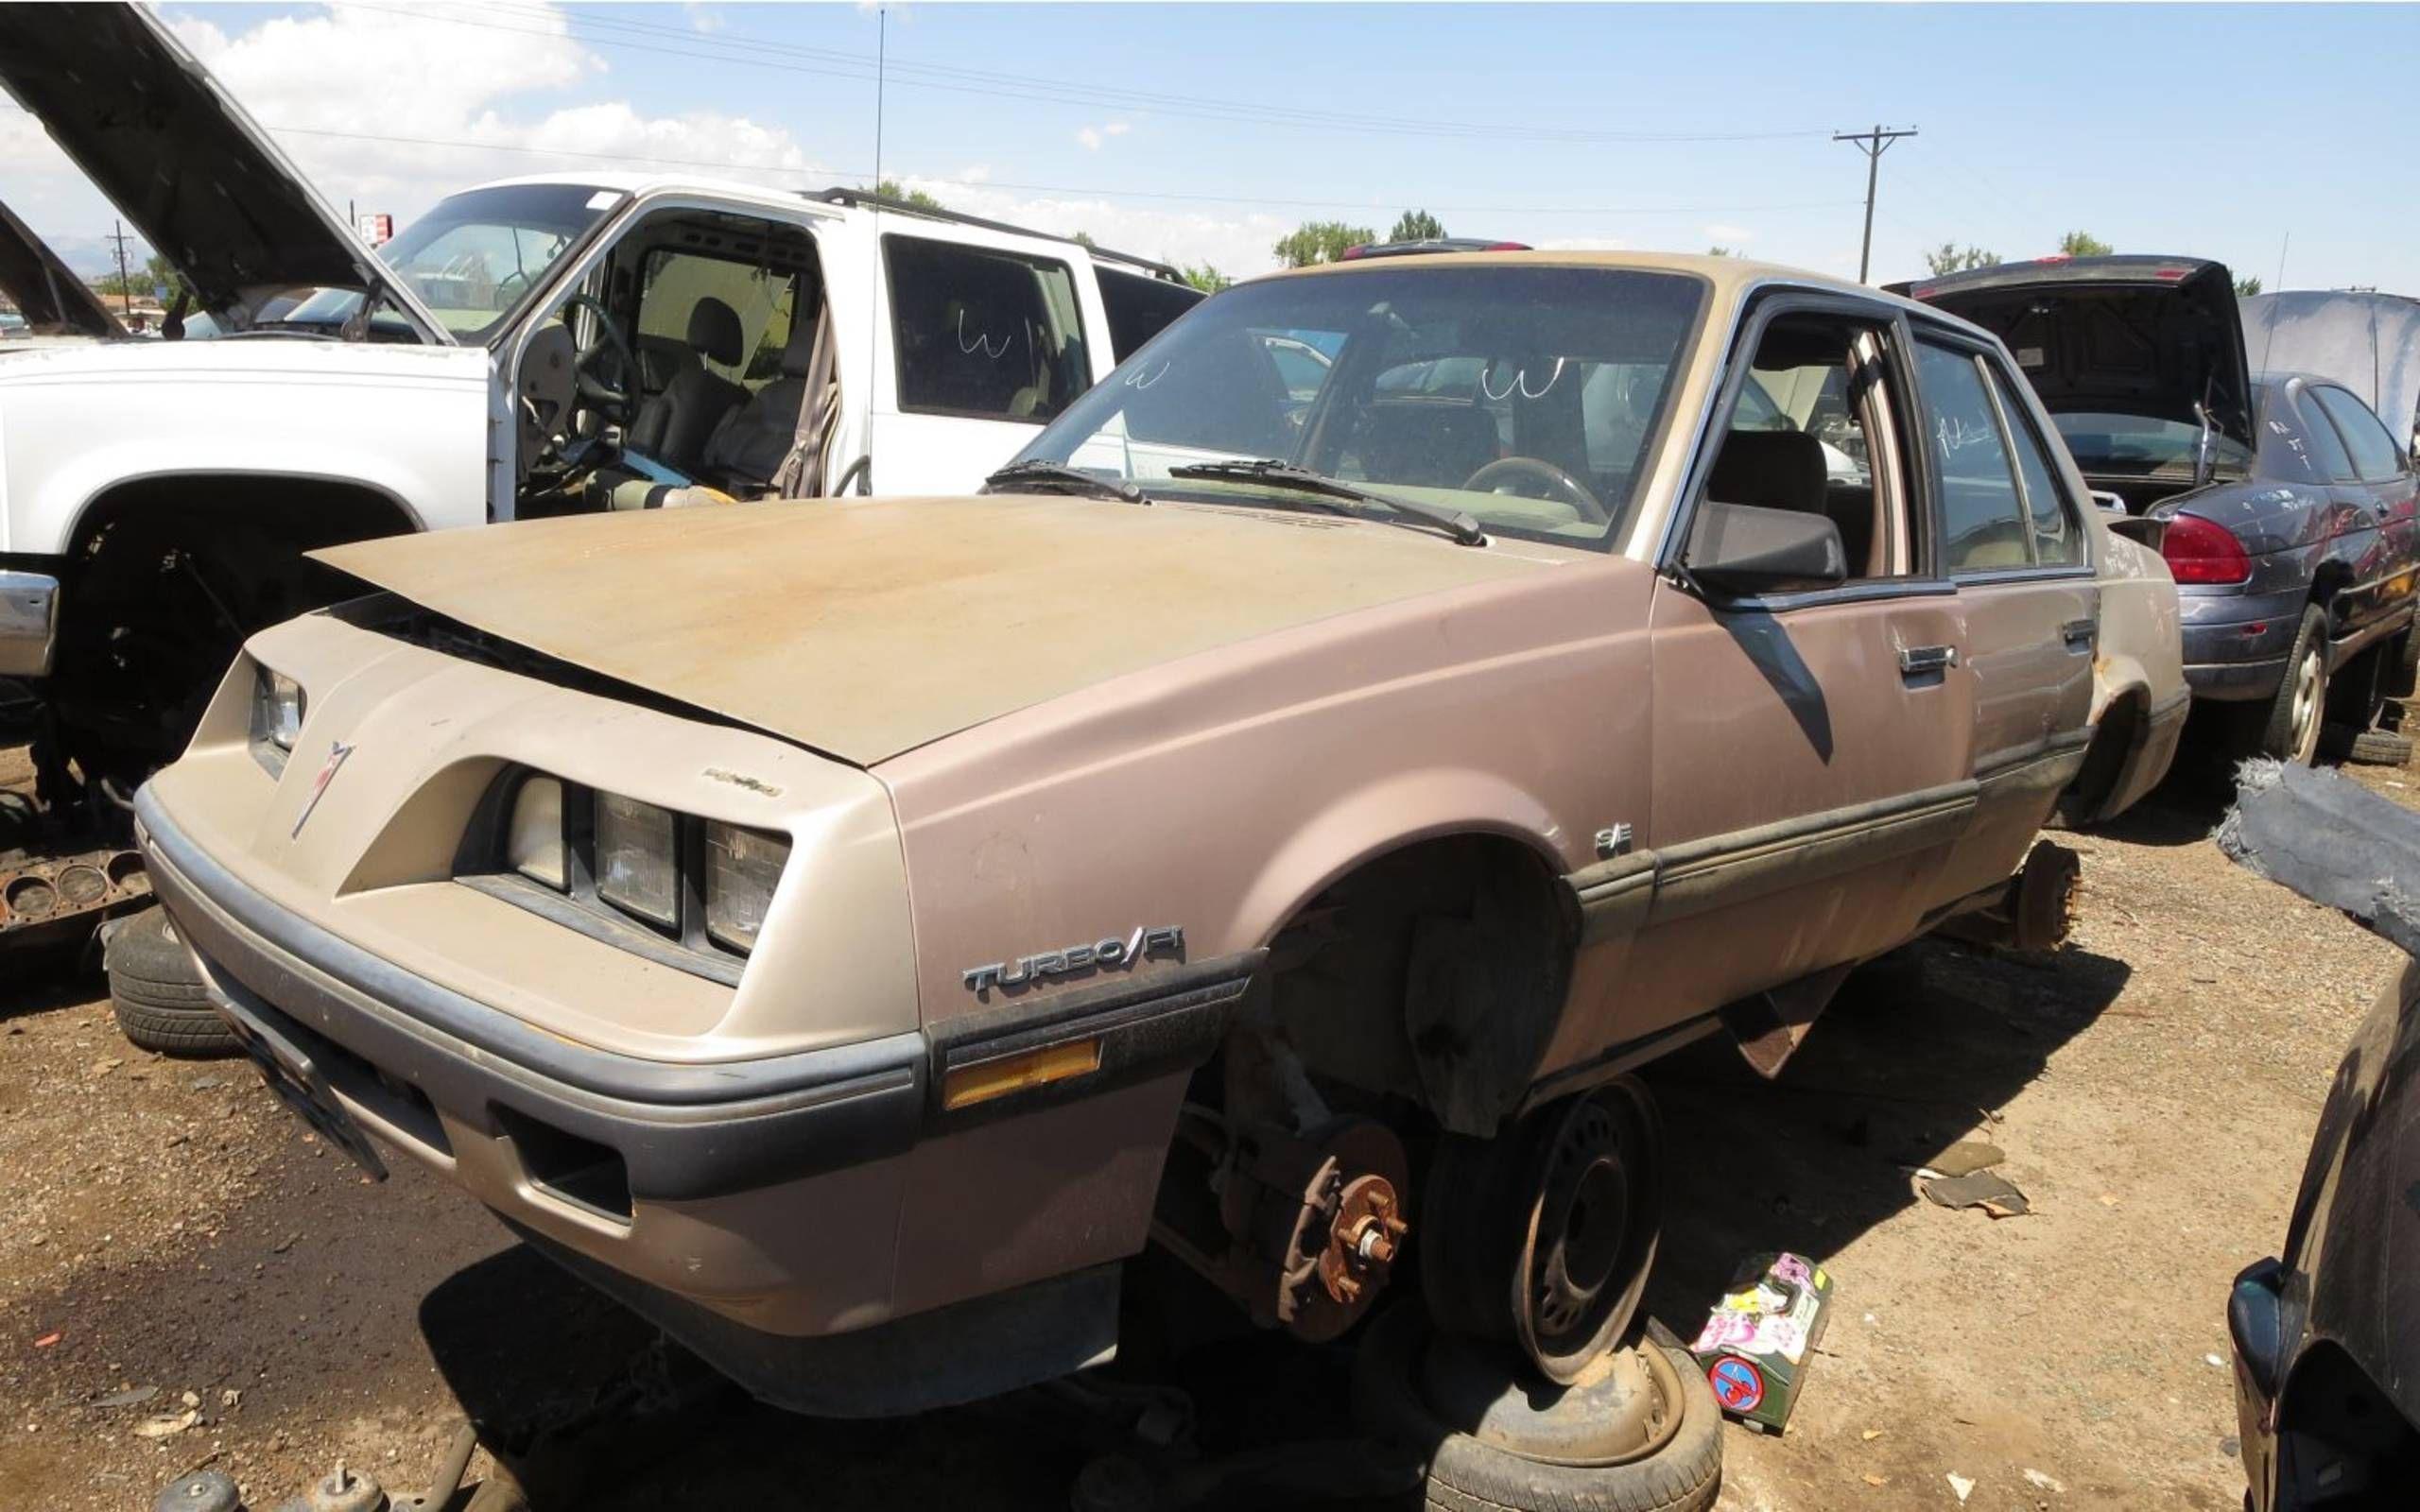 junkyard treasure 1984 pontiac 2000 sunbird s e turbo 1984 pontiac 2000 sunbird s e turbo